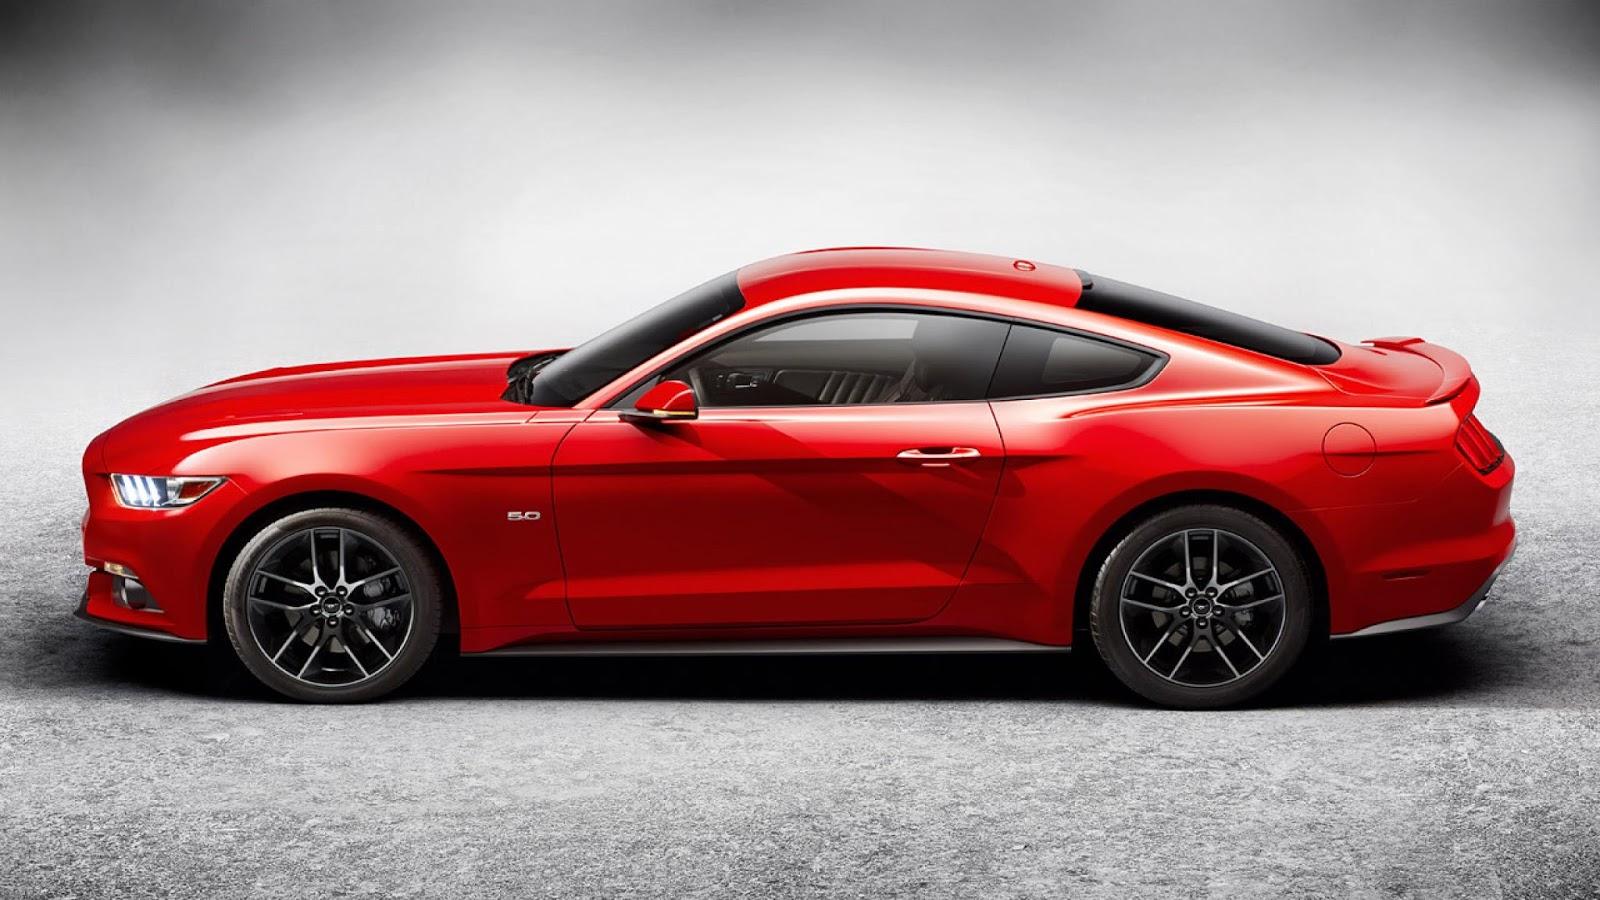 red ford mustang side view Η Ford αύξησε 20% τις Ευρωπαϊκές πωλήσεις της και έχει ήδη 12.000 παραγγελίες της νέας Mustang Ford, Ford Mustang, Ford Ranger, Ford Transit, Sales, πωλήσεις